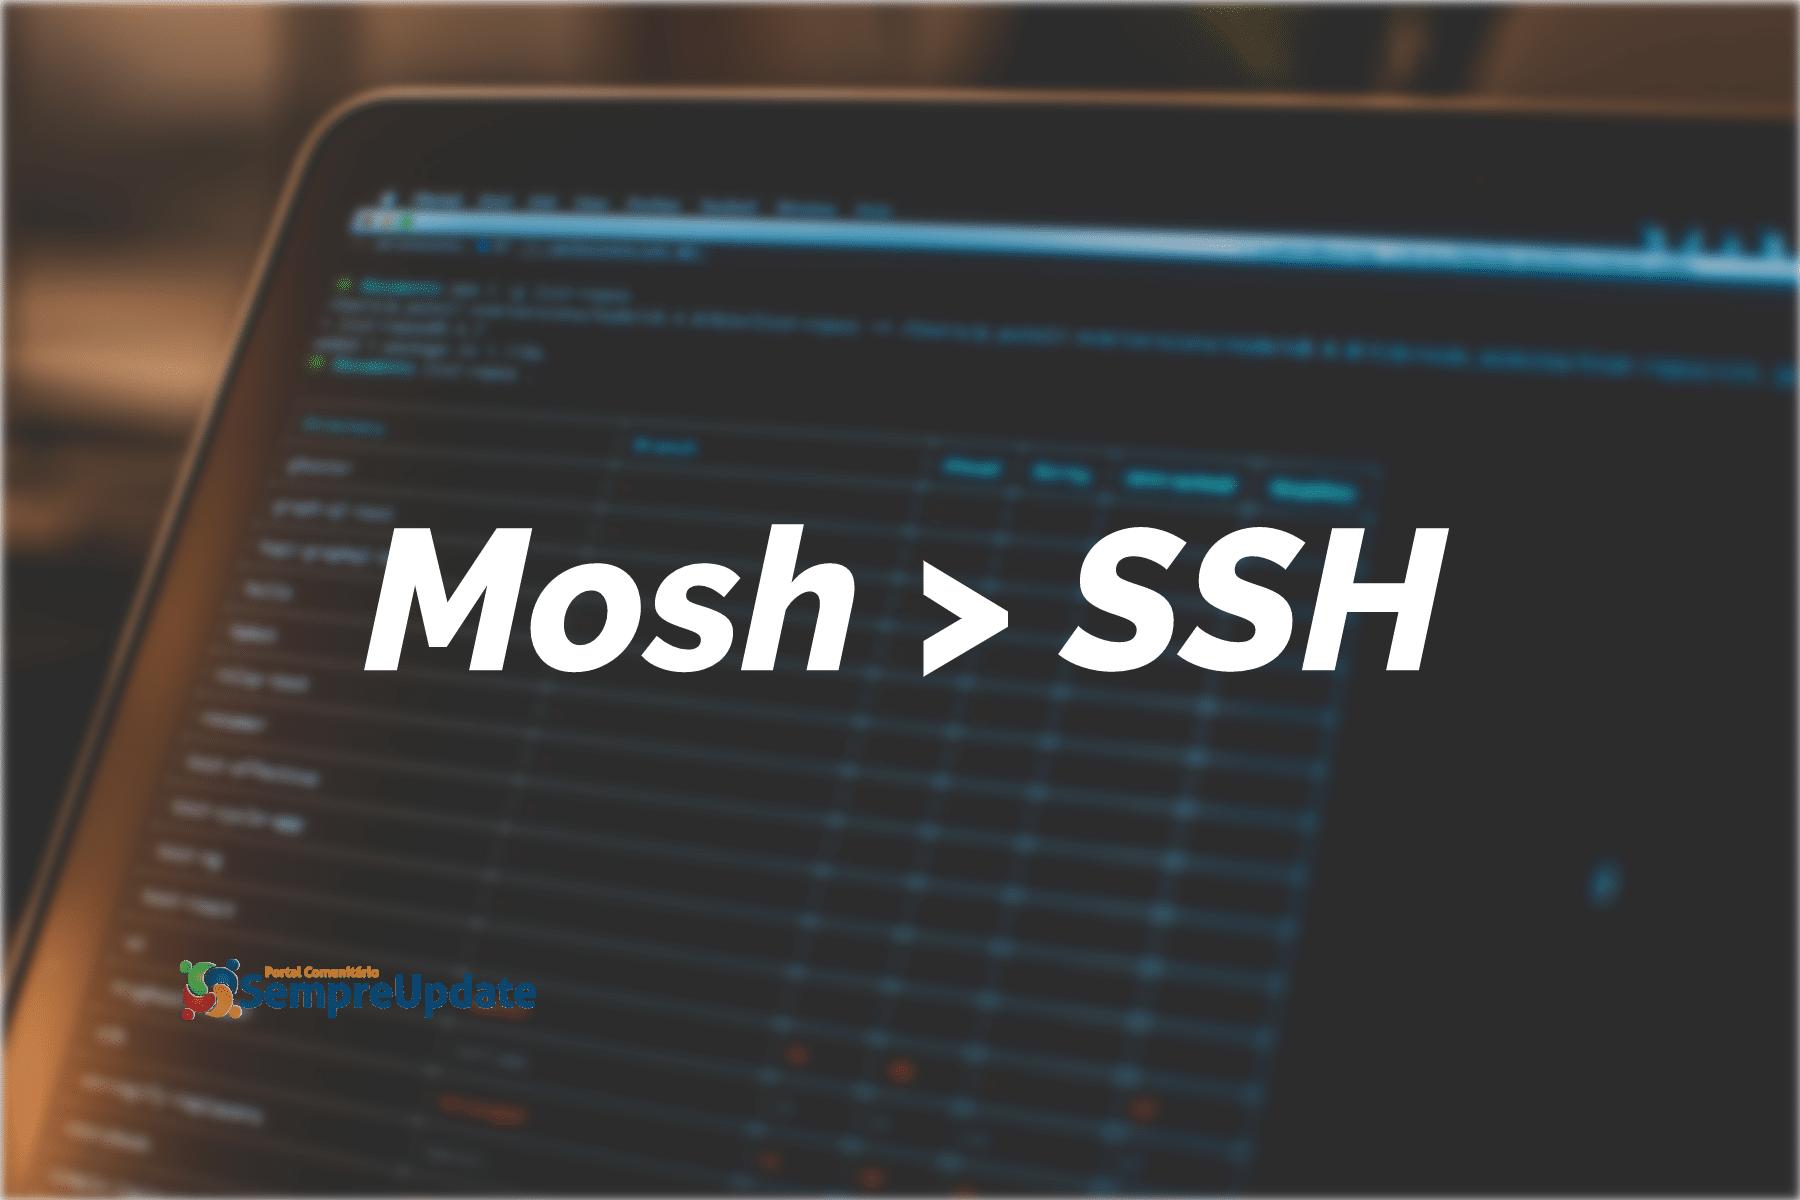 instalar-mosh-mobile-shell-no-ubuntu-debian-fedora-opensuse-2019